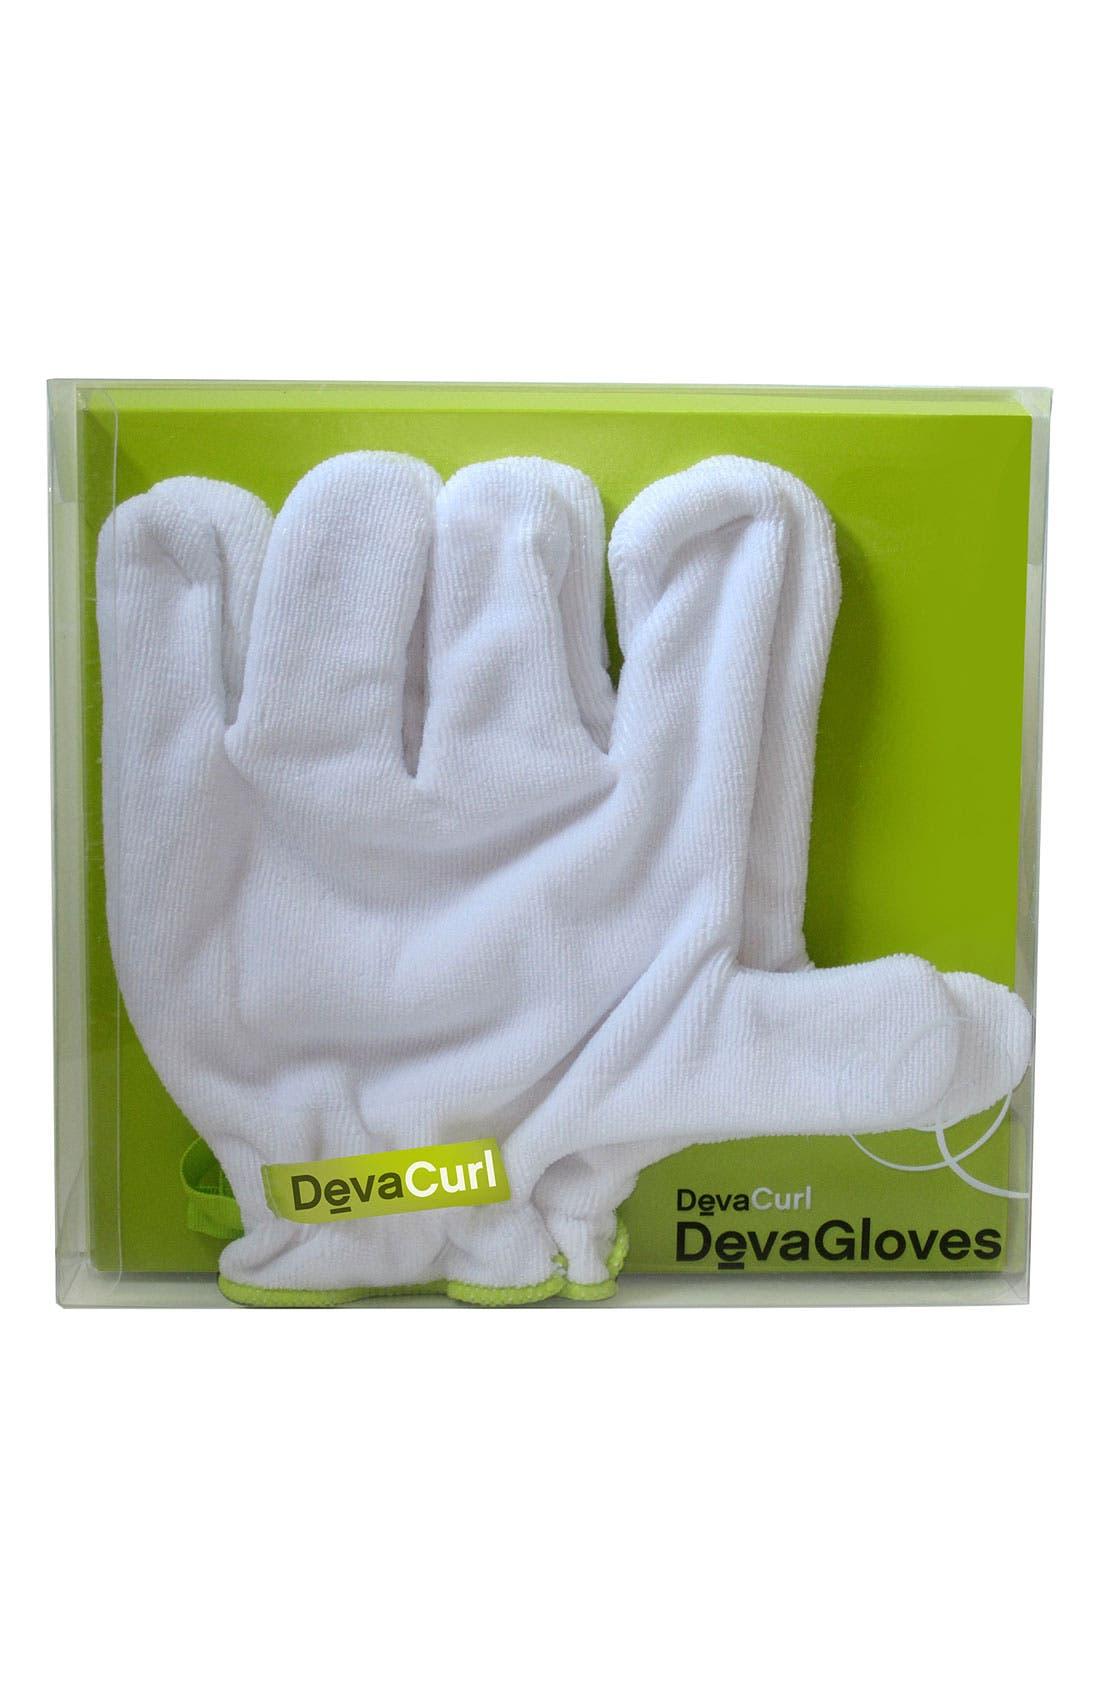 Alternate Image 1 Selected - DevaCurl 'DevaGloves' Microfiber Gloves